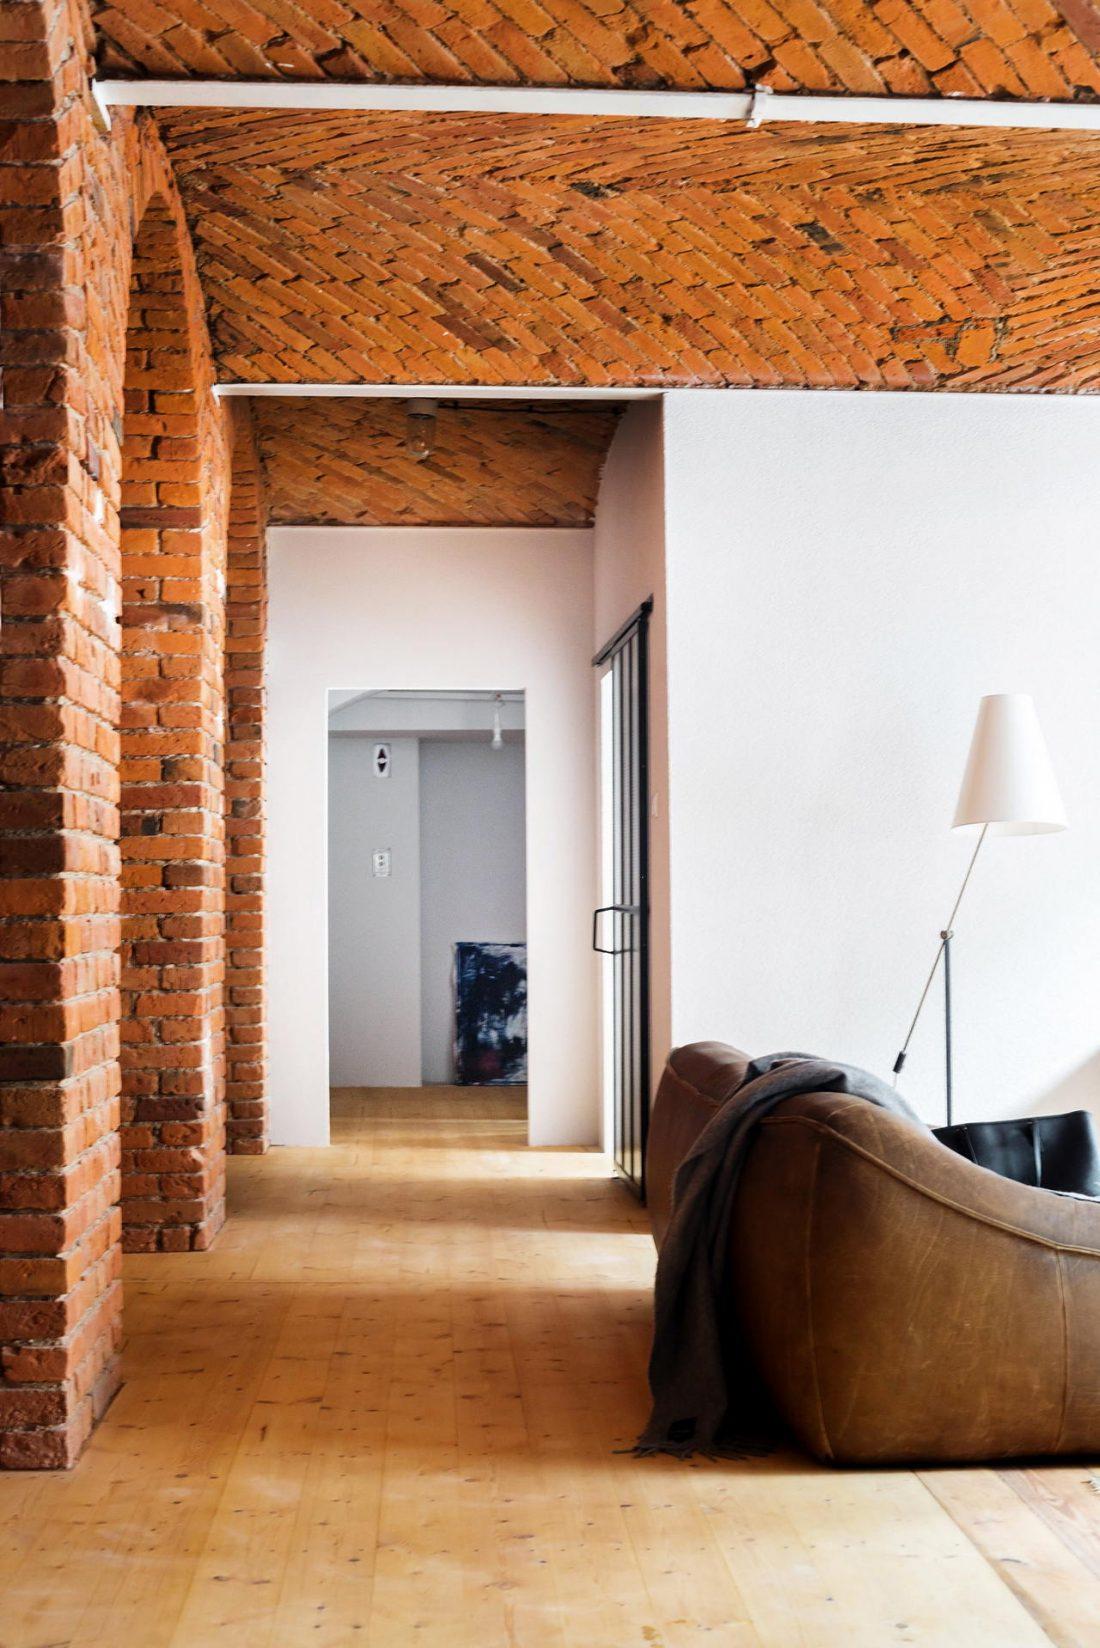 Дизайн интерьера квартиры в стиле лофт 27